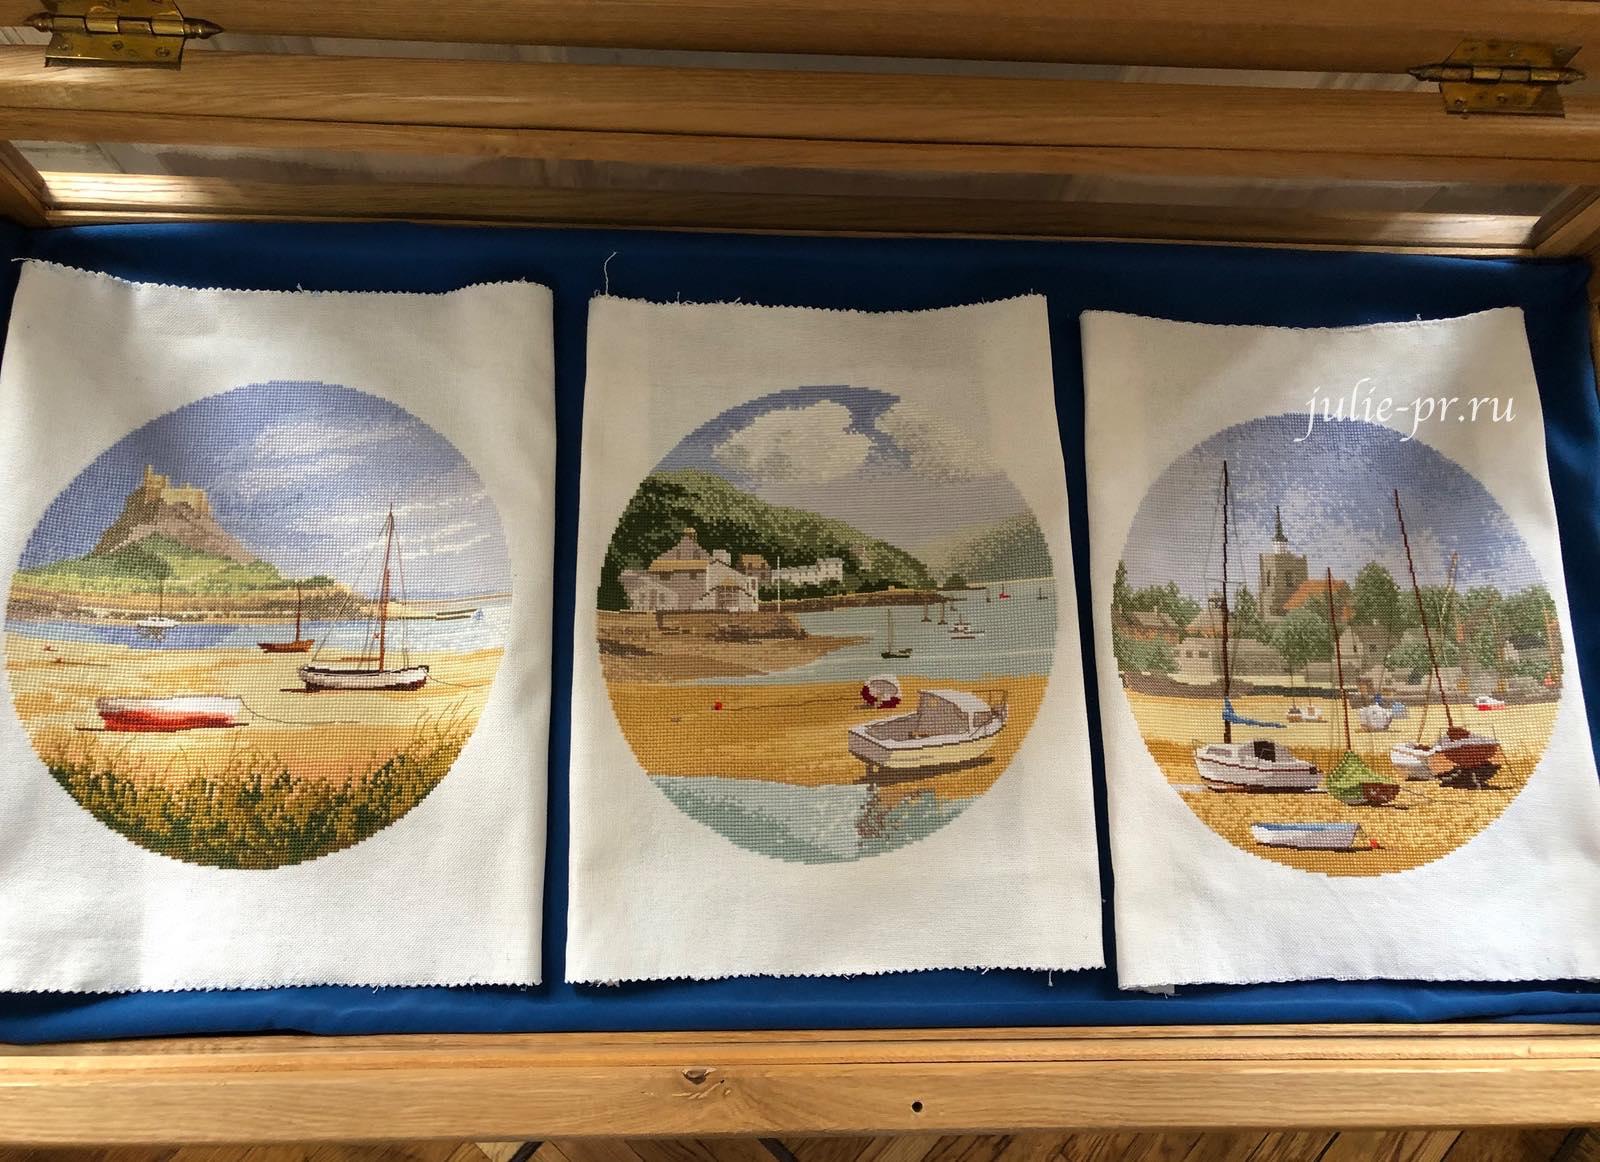 Lindisfarne, Low Tide, High and Dry, море, круги Клейтона, вышивка крестом, Heritage, John Clayton, выставка Грани Джона Клейтона